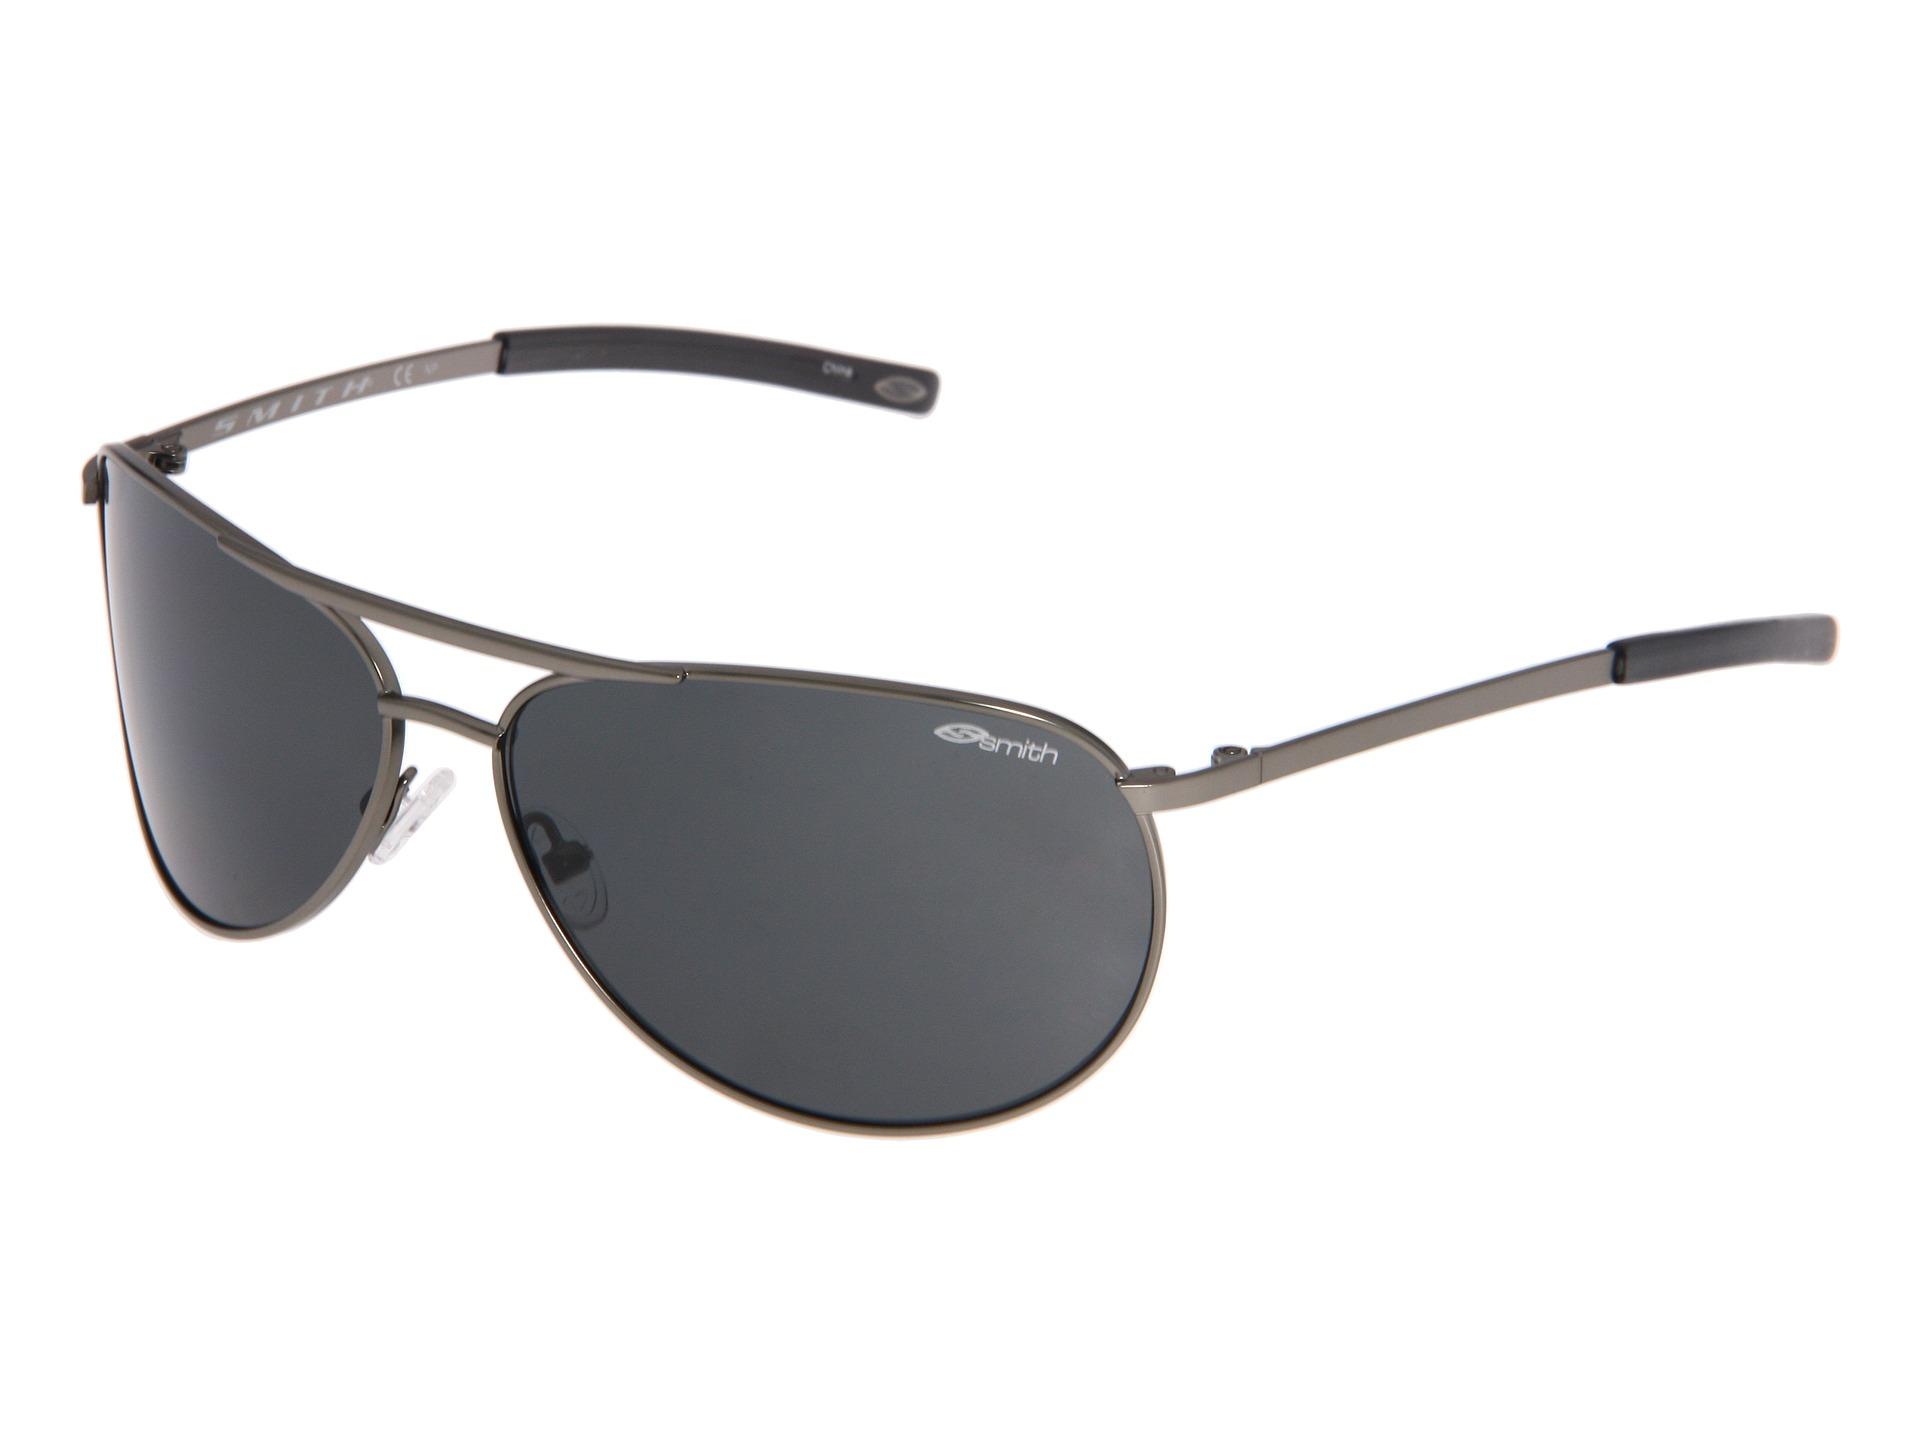 15a26a596f23 Smith Serpico Slim Polarized Sunglasses « Heritage Malta